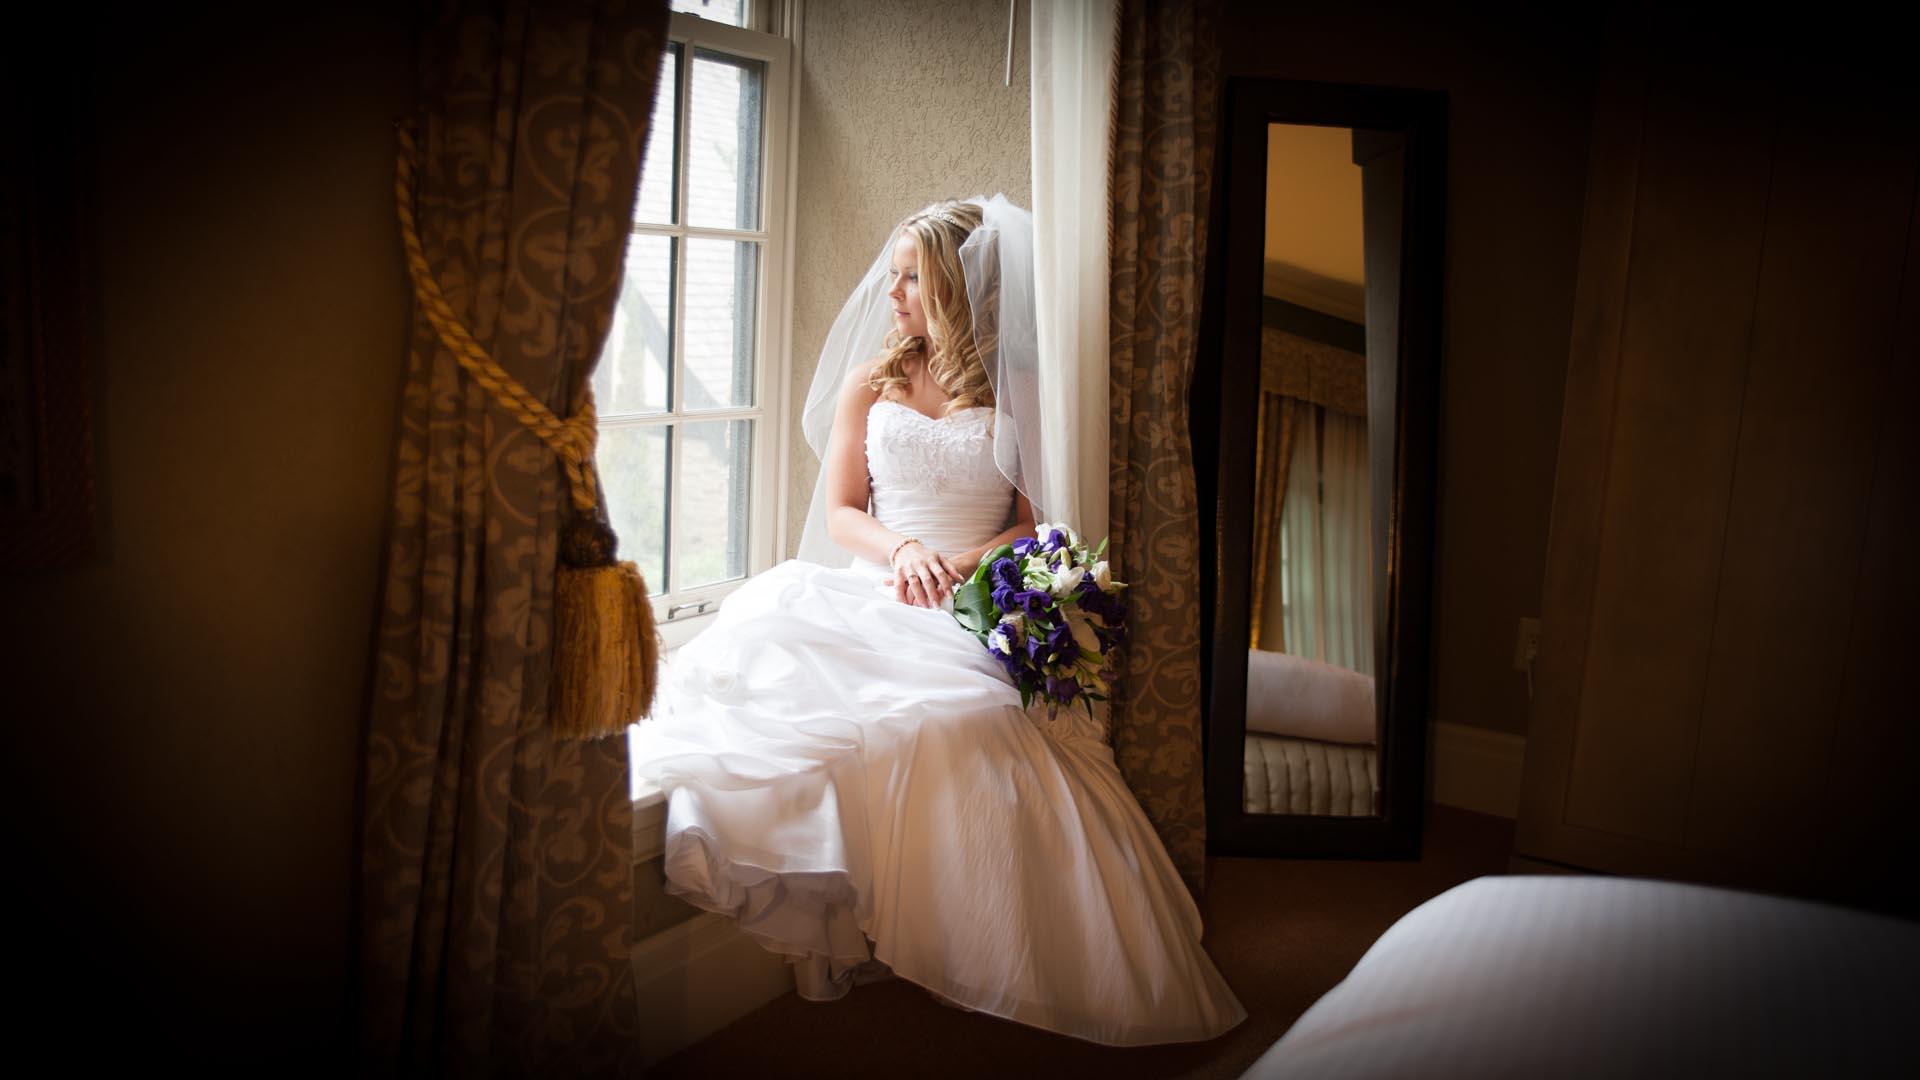 Bride pondering her wedding